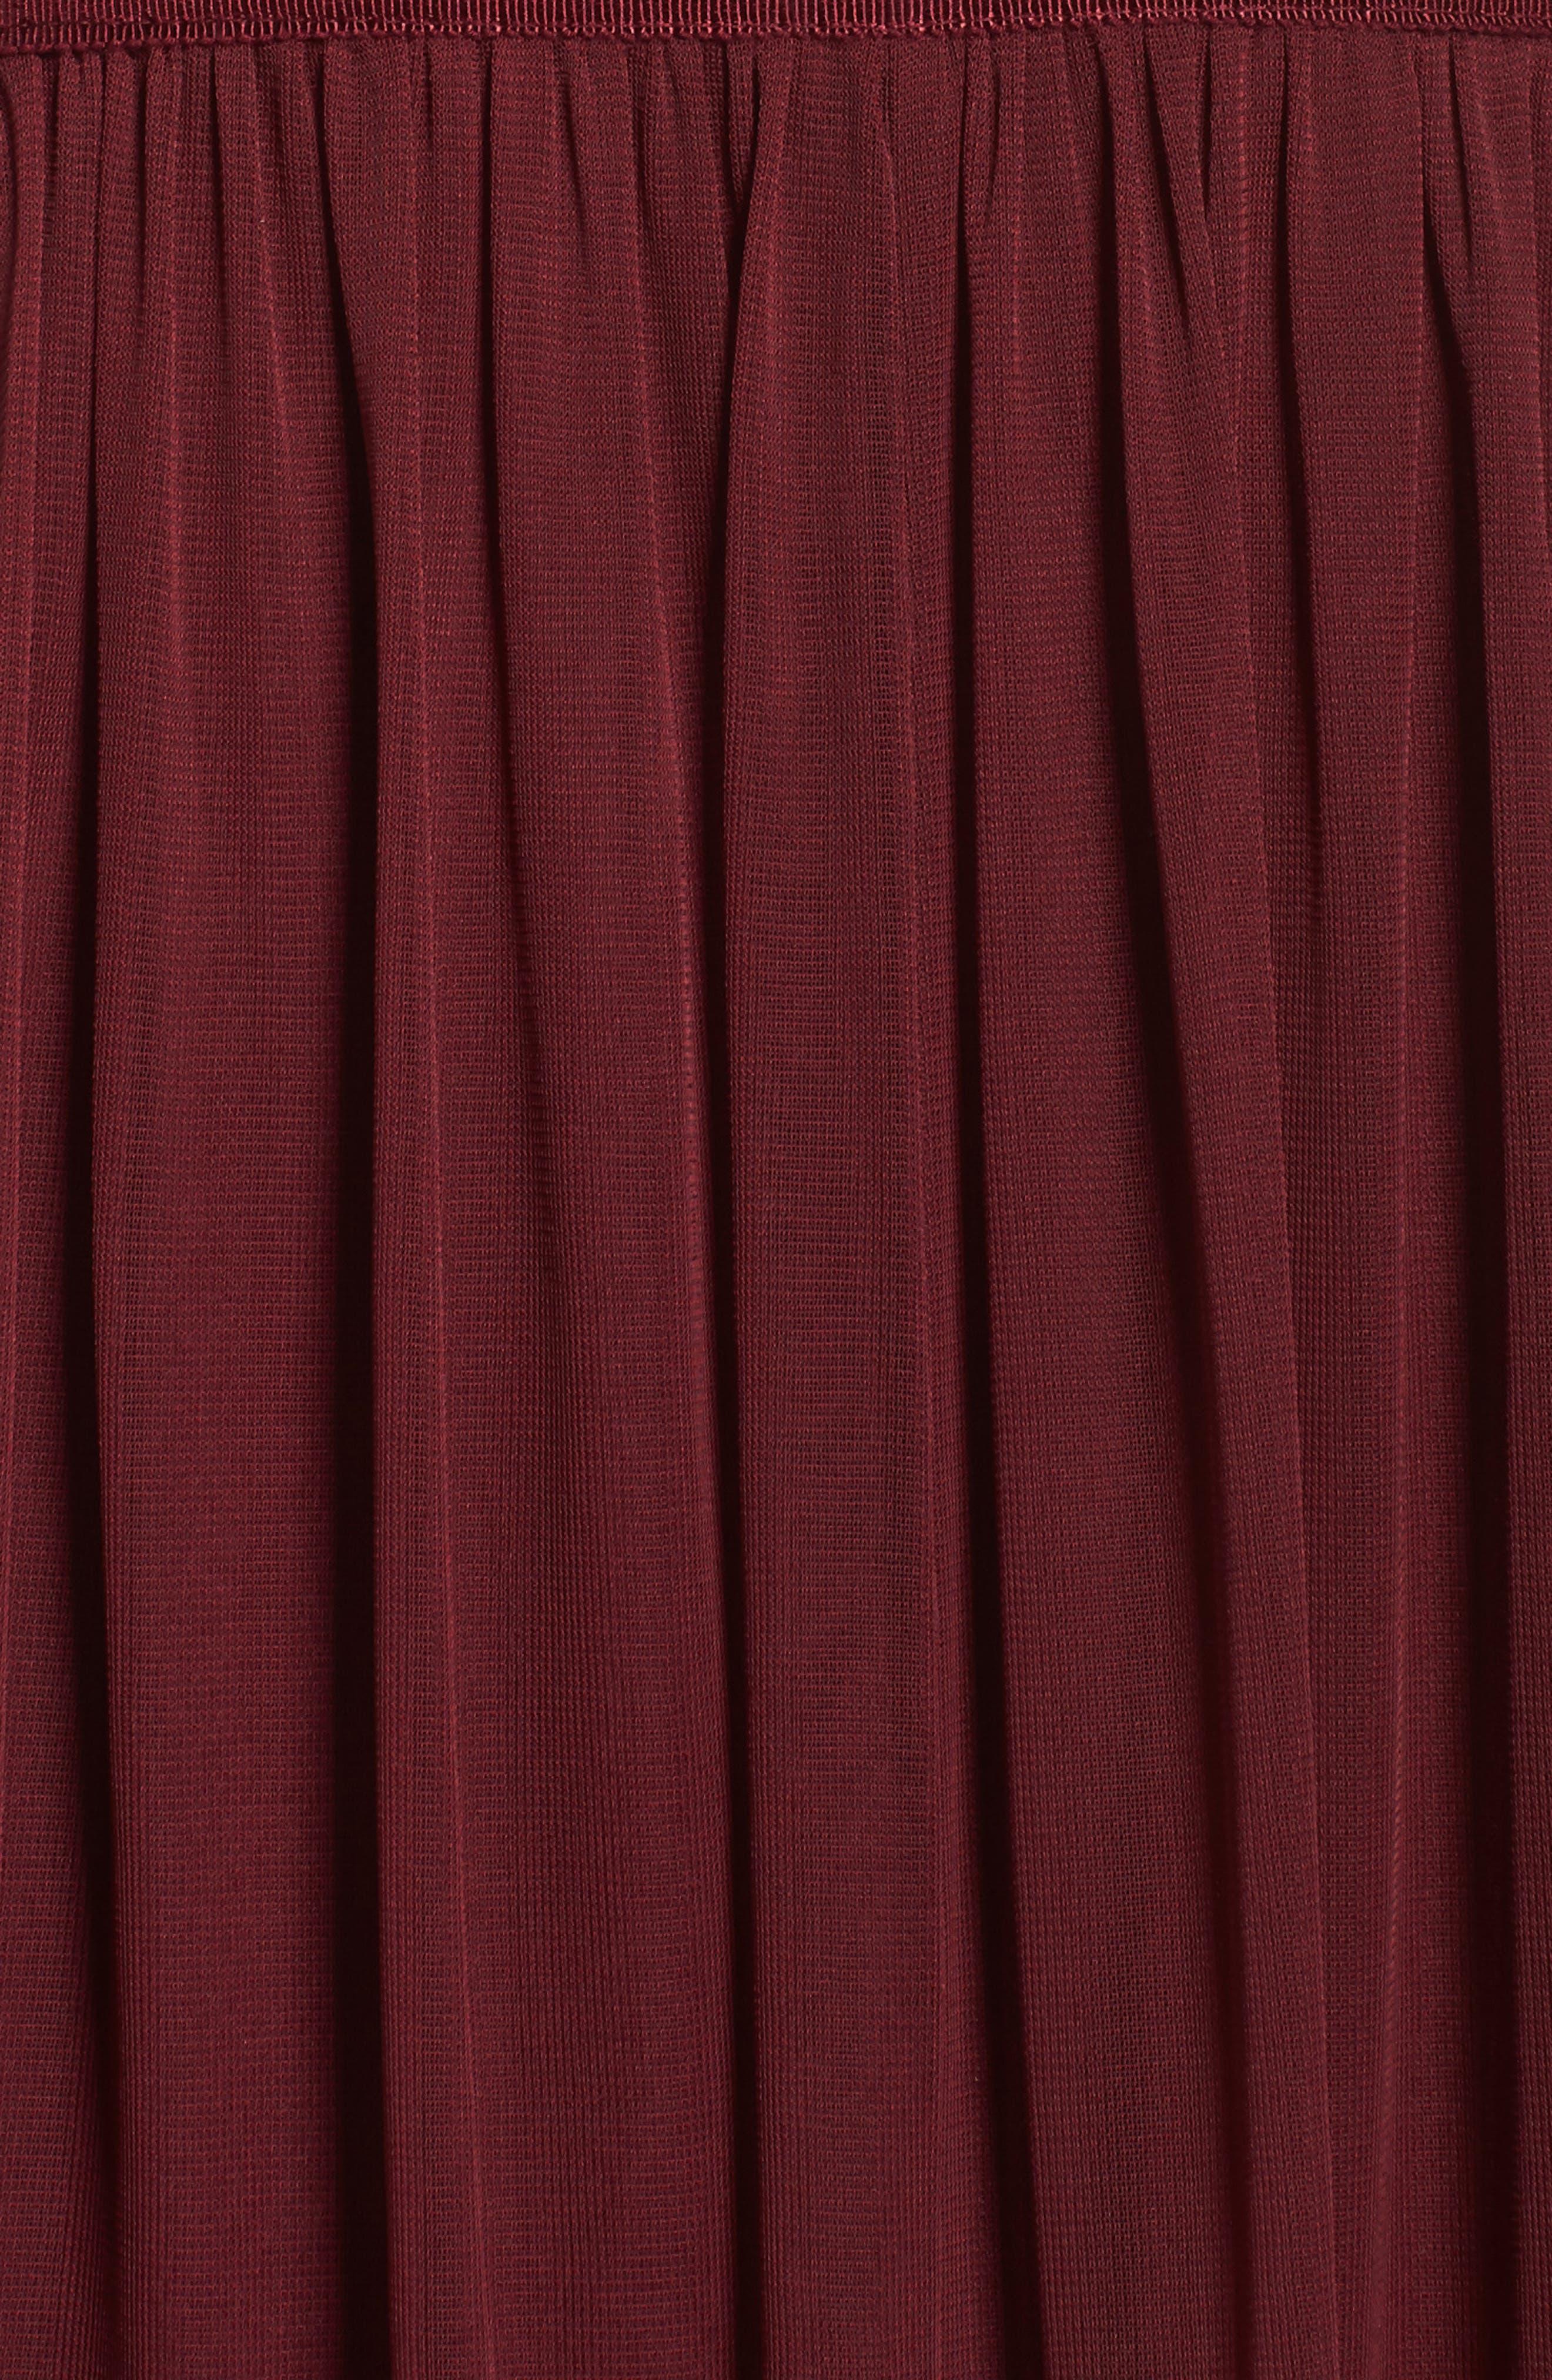 Sequin Lace & Tulle Gown,                             Alternate thumbnail 5, color,                             Black Cherry